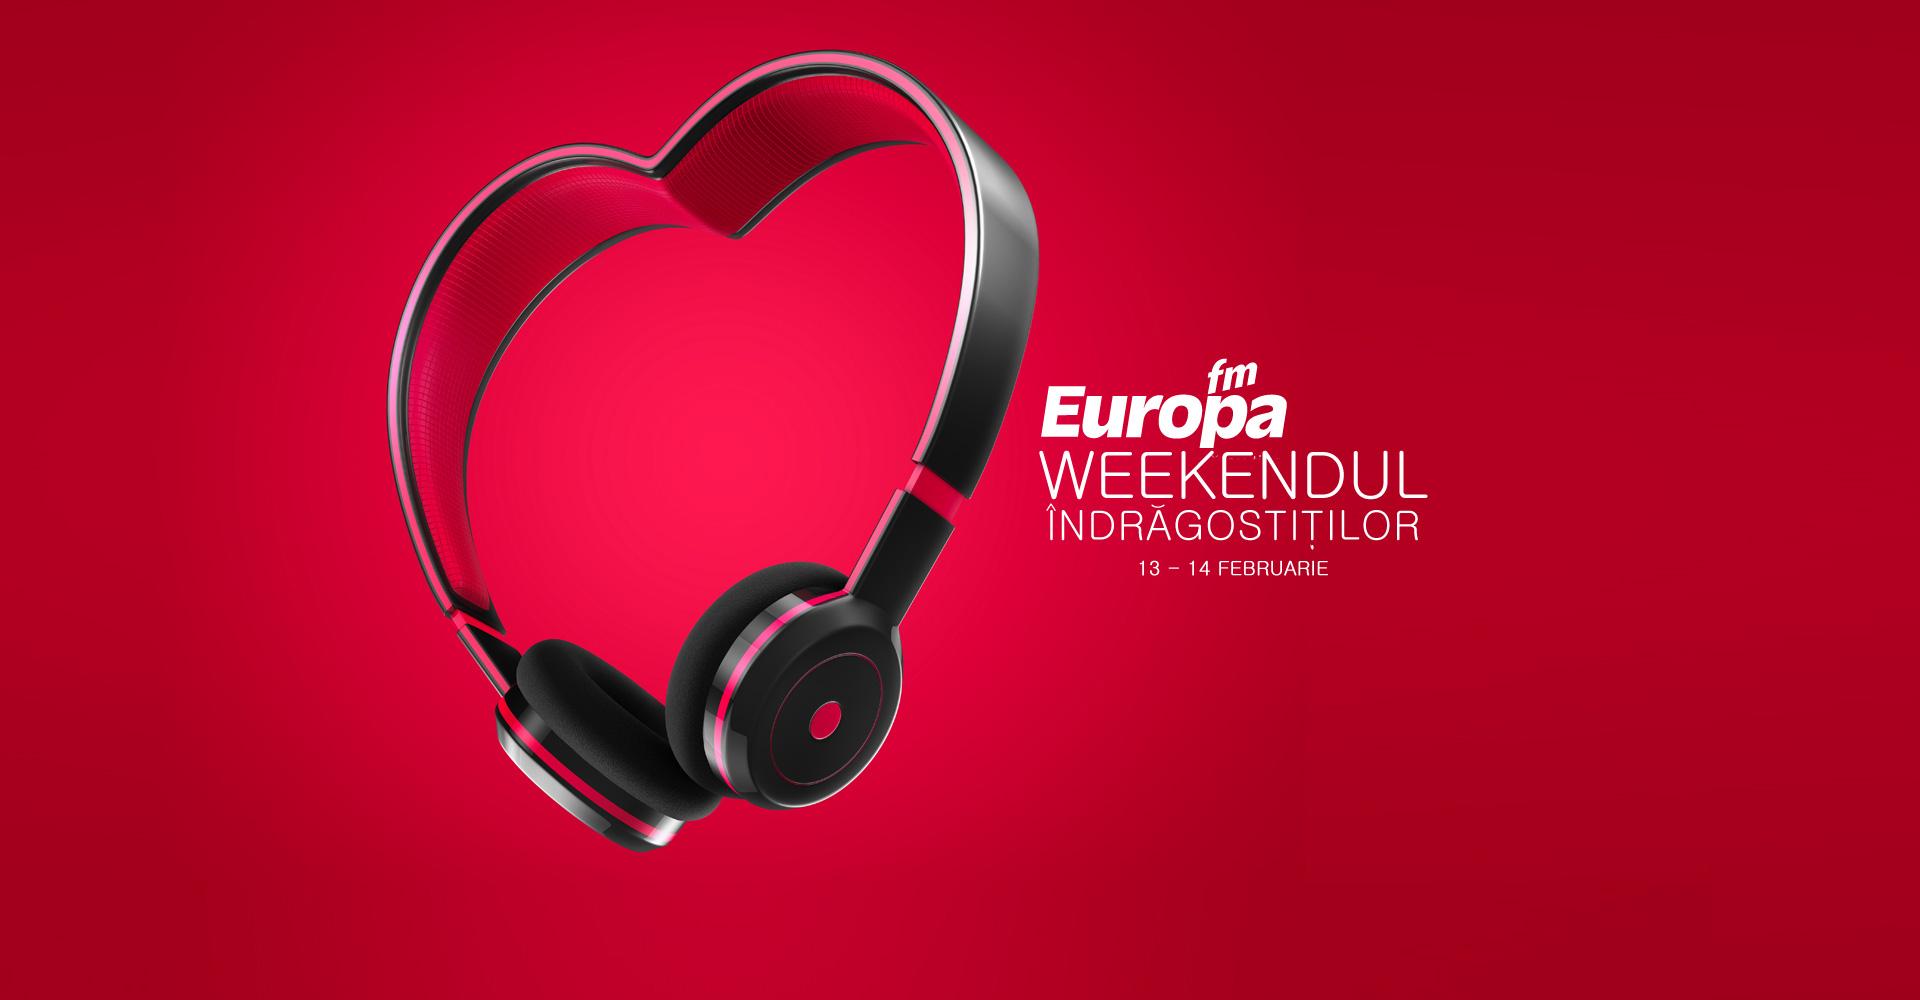 weekendul-Indragostitilor-la-Europa-FM-februarie-2016